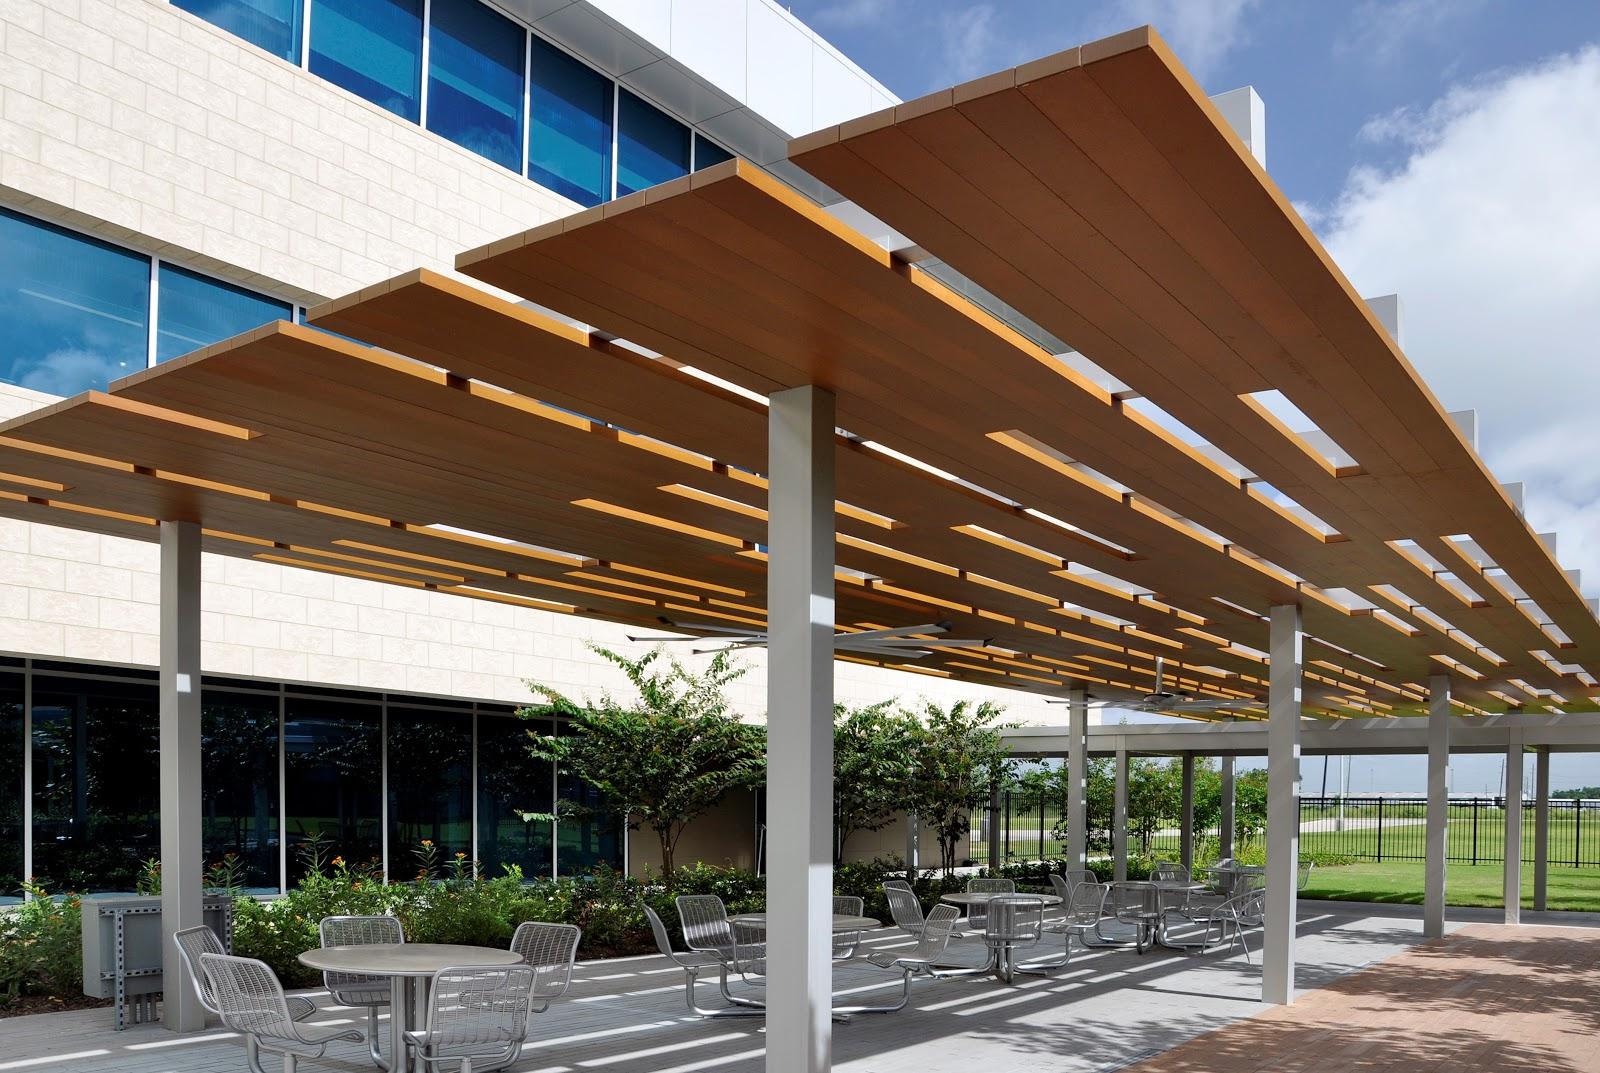 avadek wood grain powder coat canopy in Tomball, TX